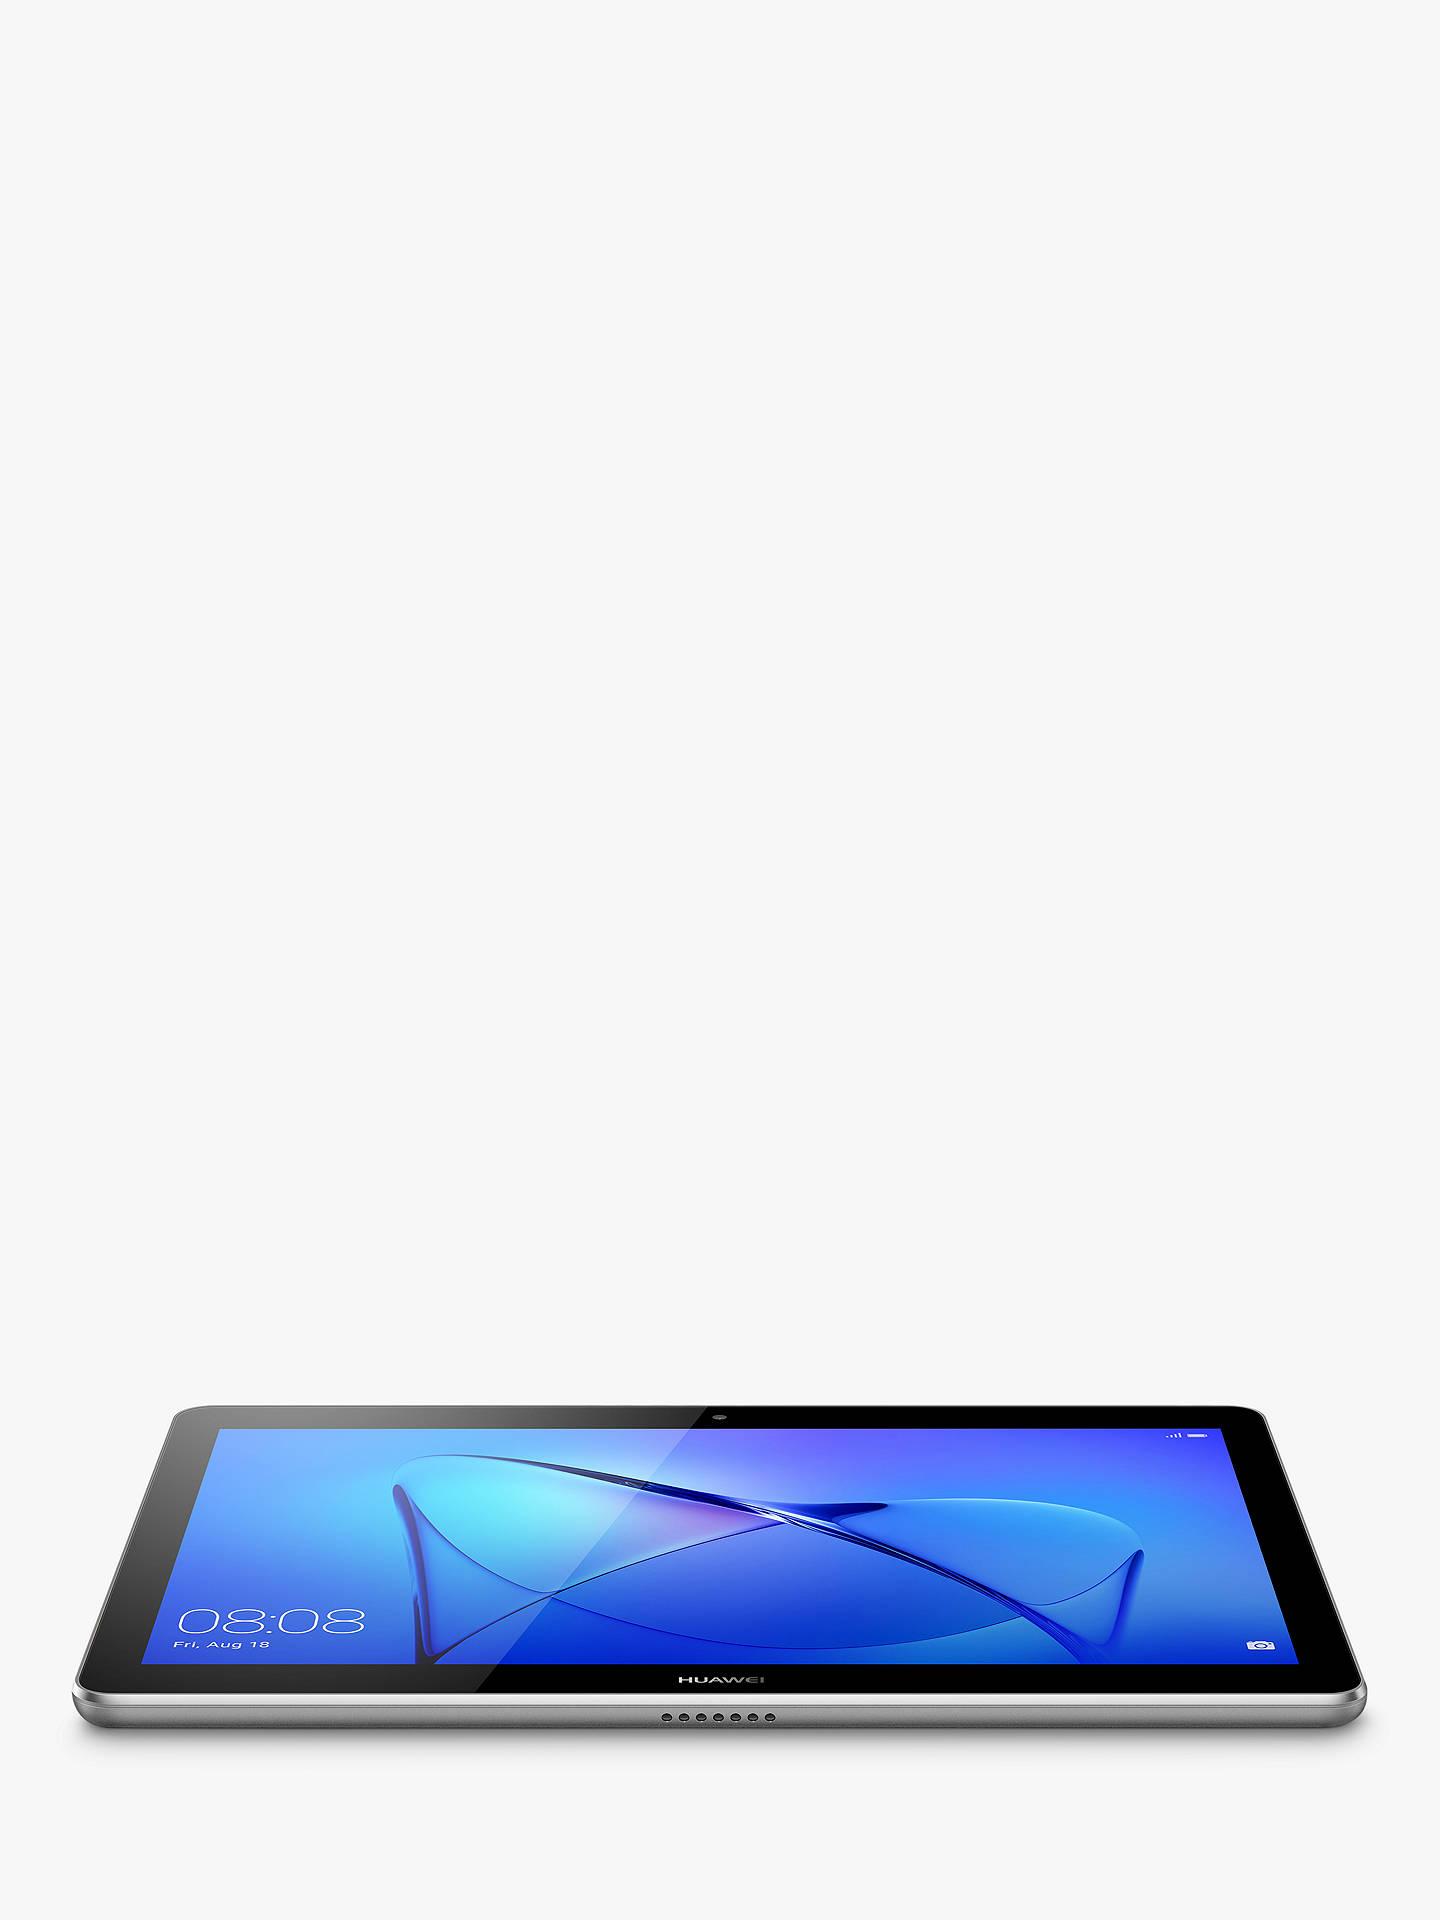 "Huawei MediaPad T3 10 Tablet, Android, Qualcomm MSM8917, 2GB RAM, 16GB  eMMC, 9 6"", Grey"